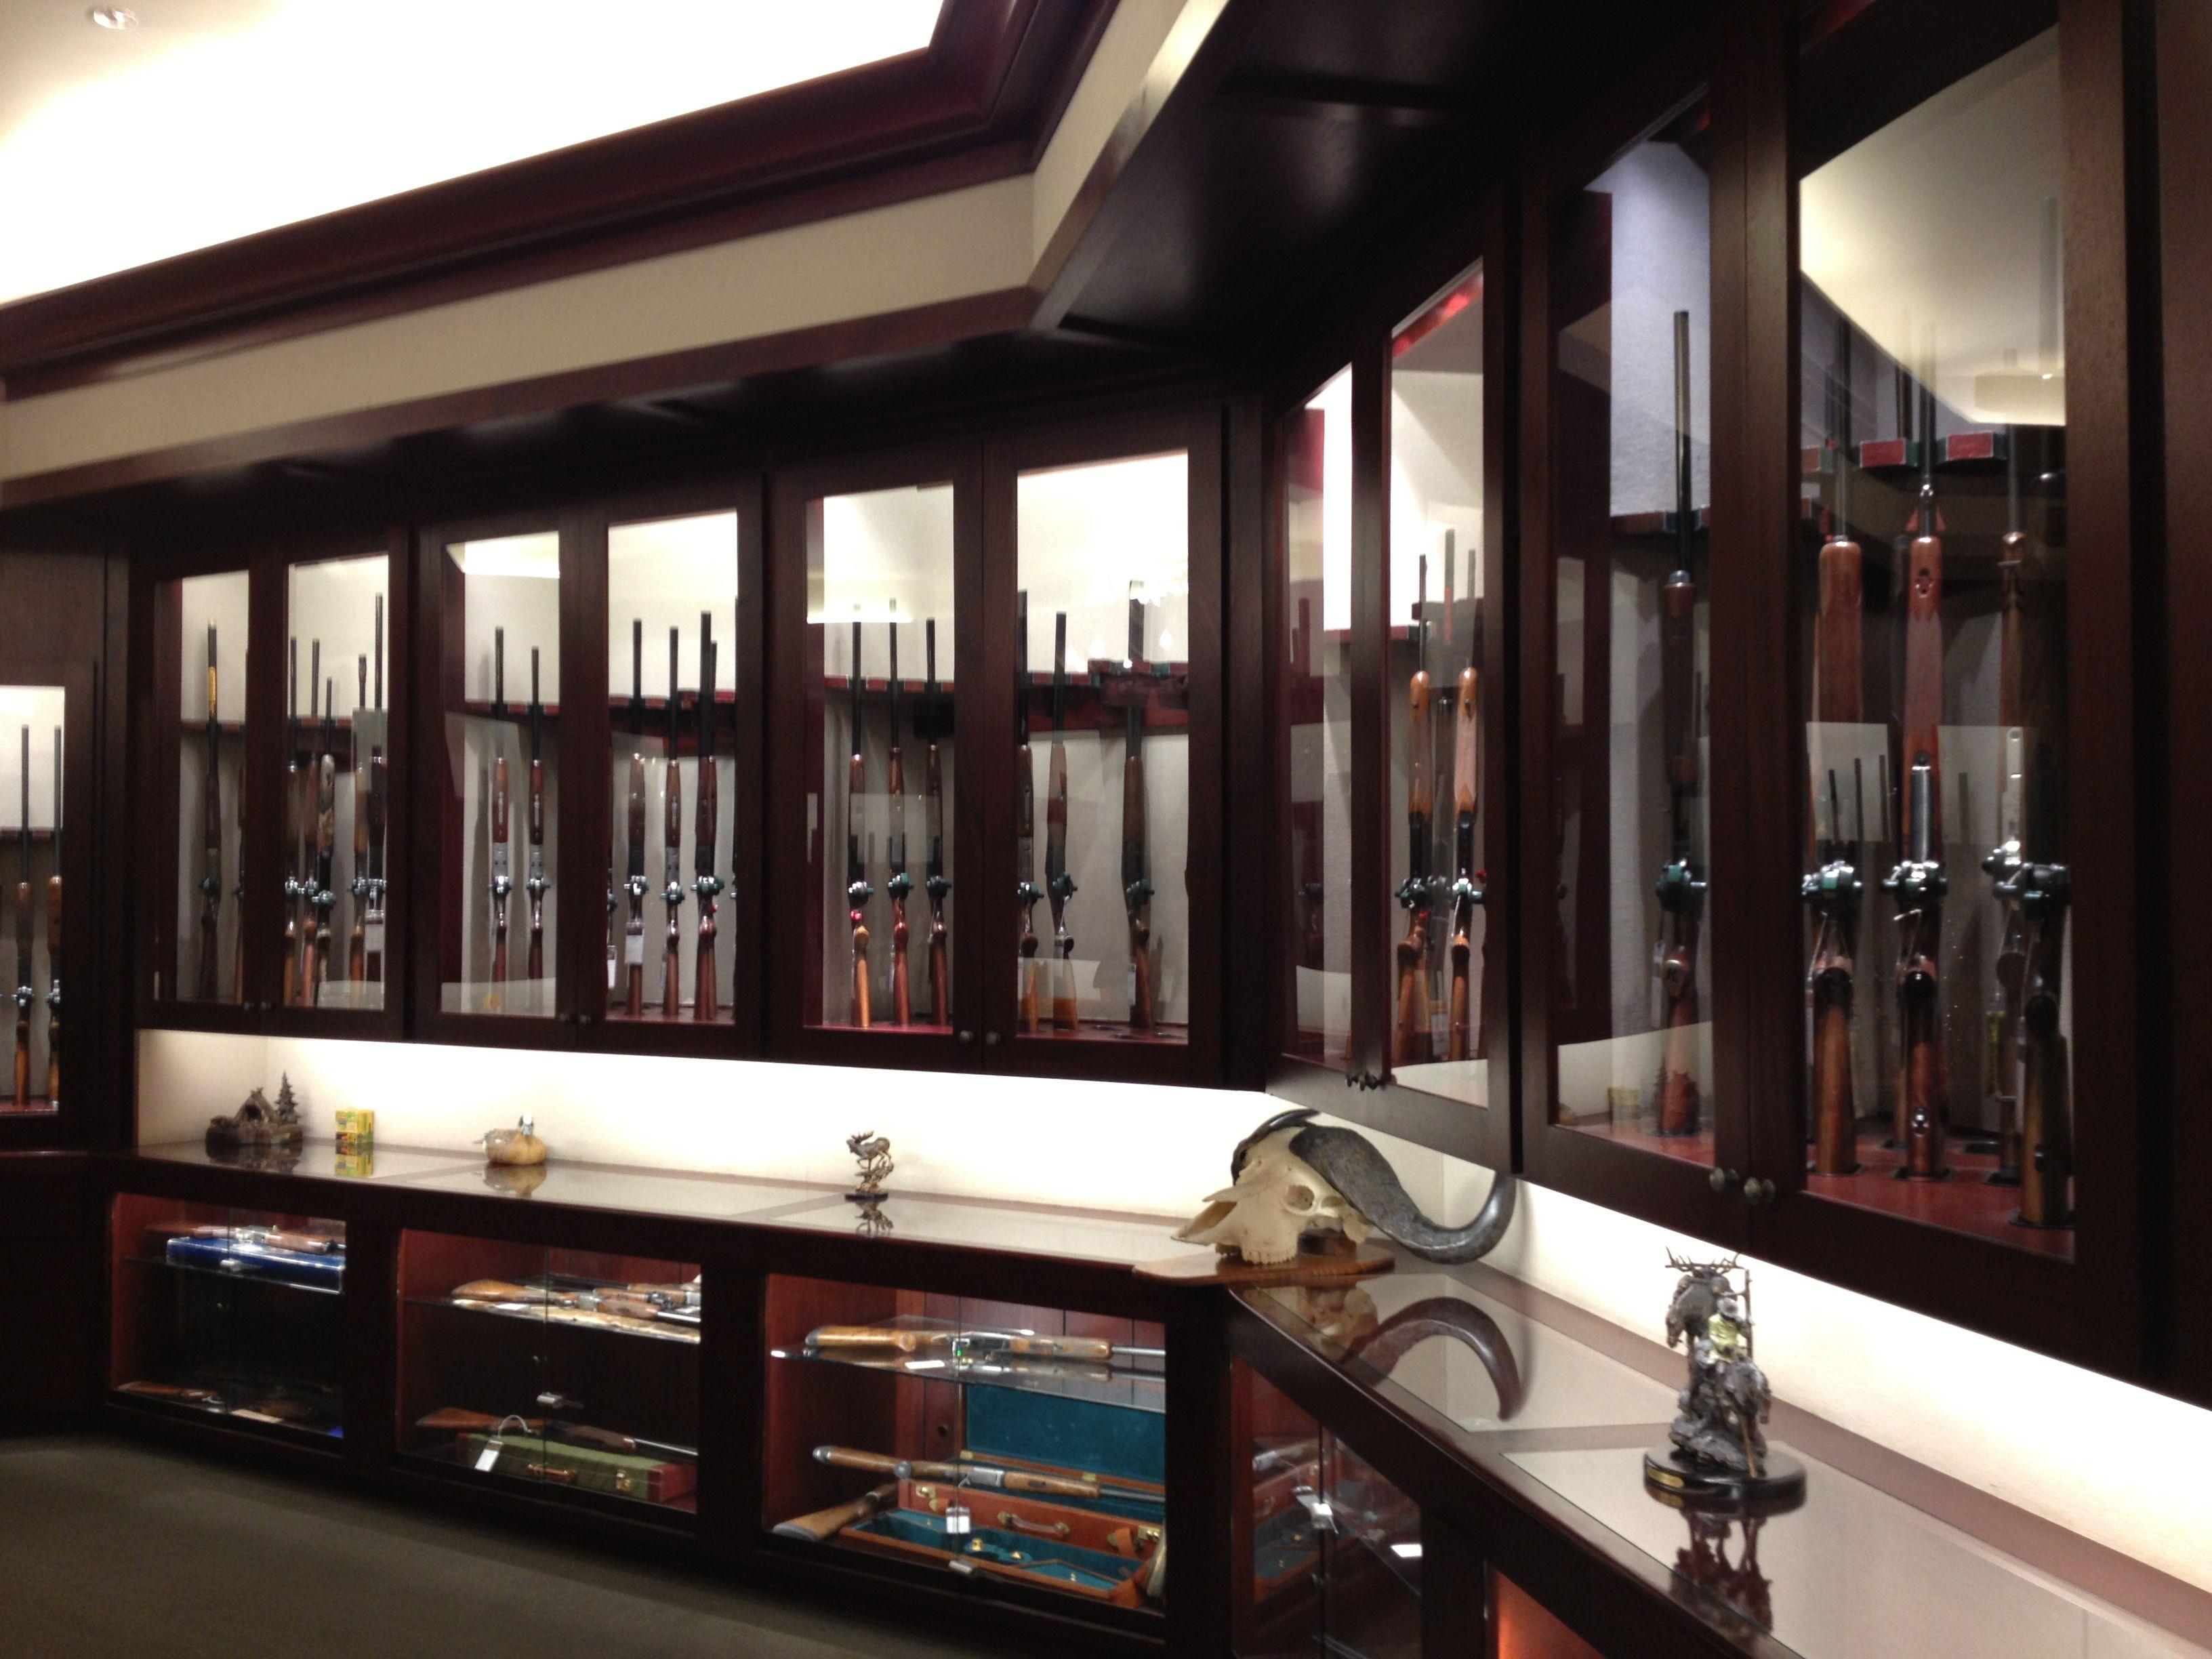 Storage Room Man Cave : Gorgeous gun rooms pinterest storage guns and